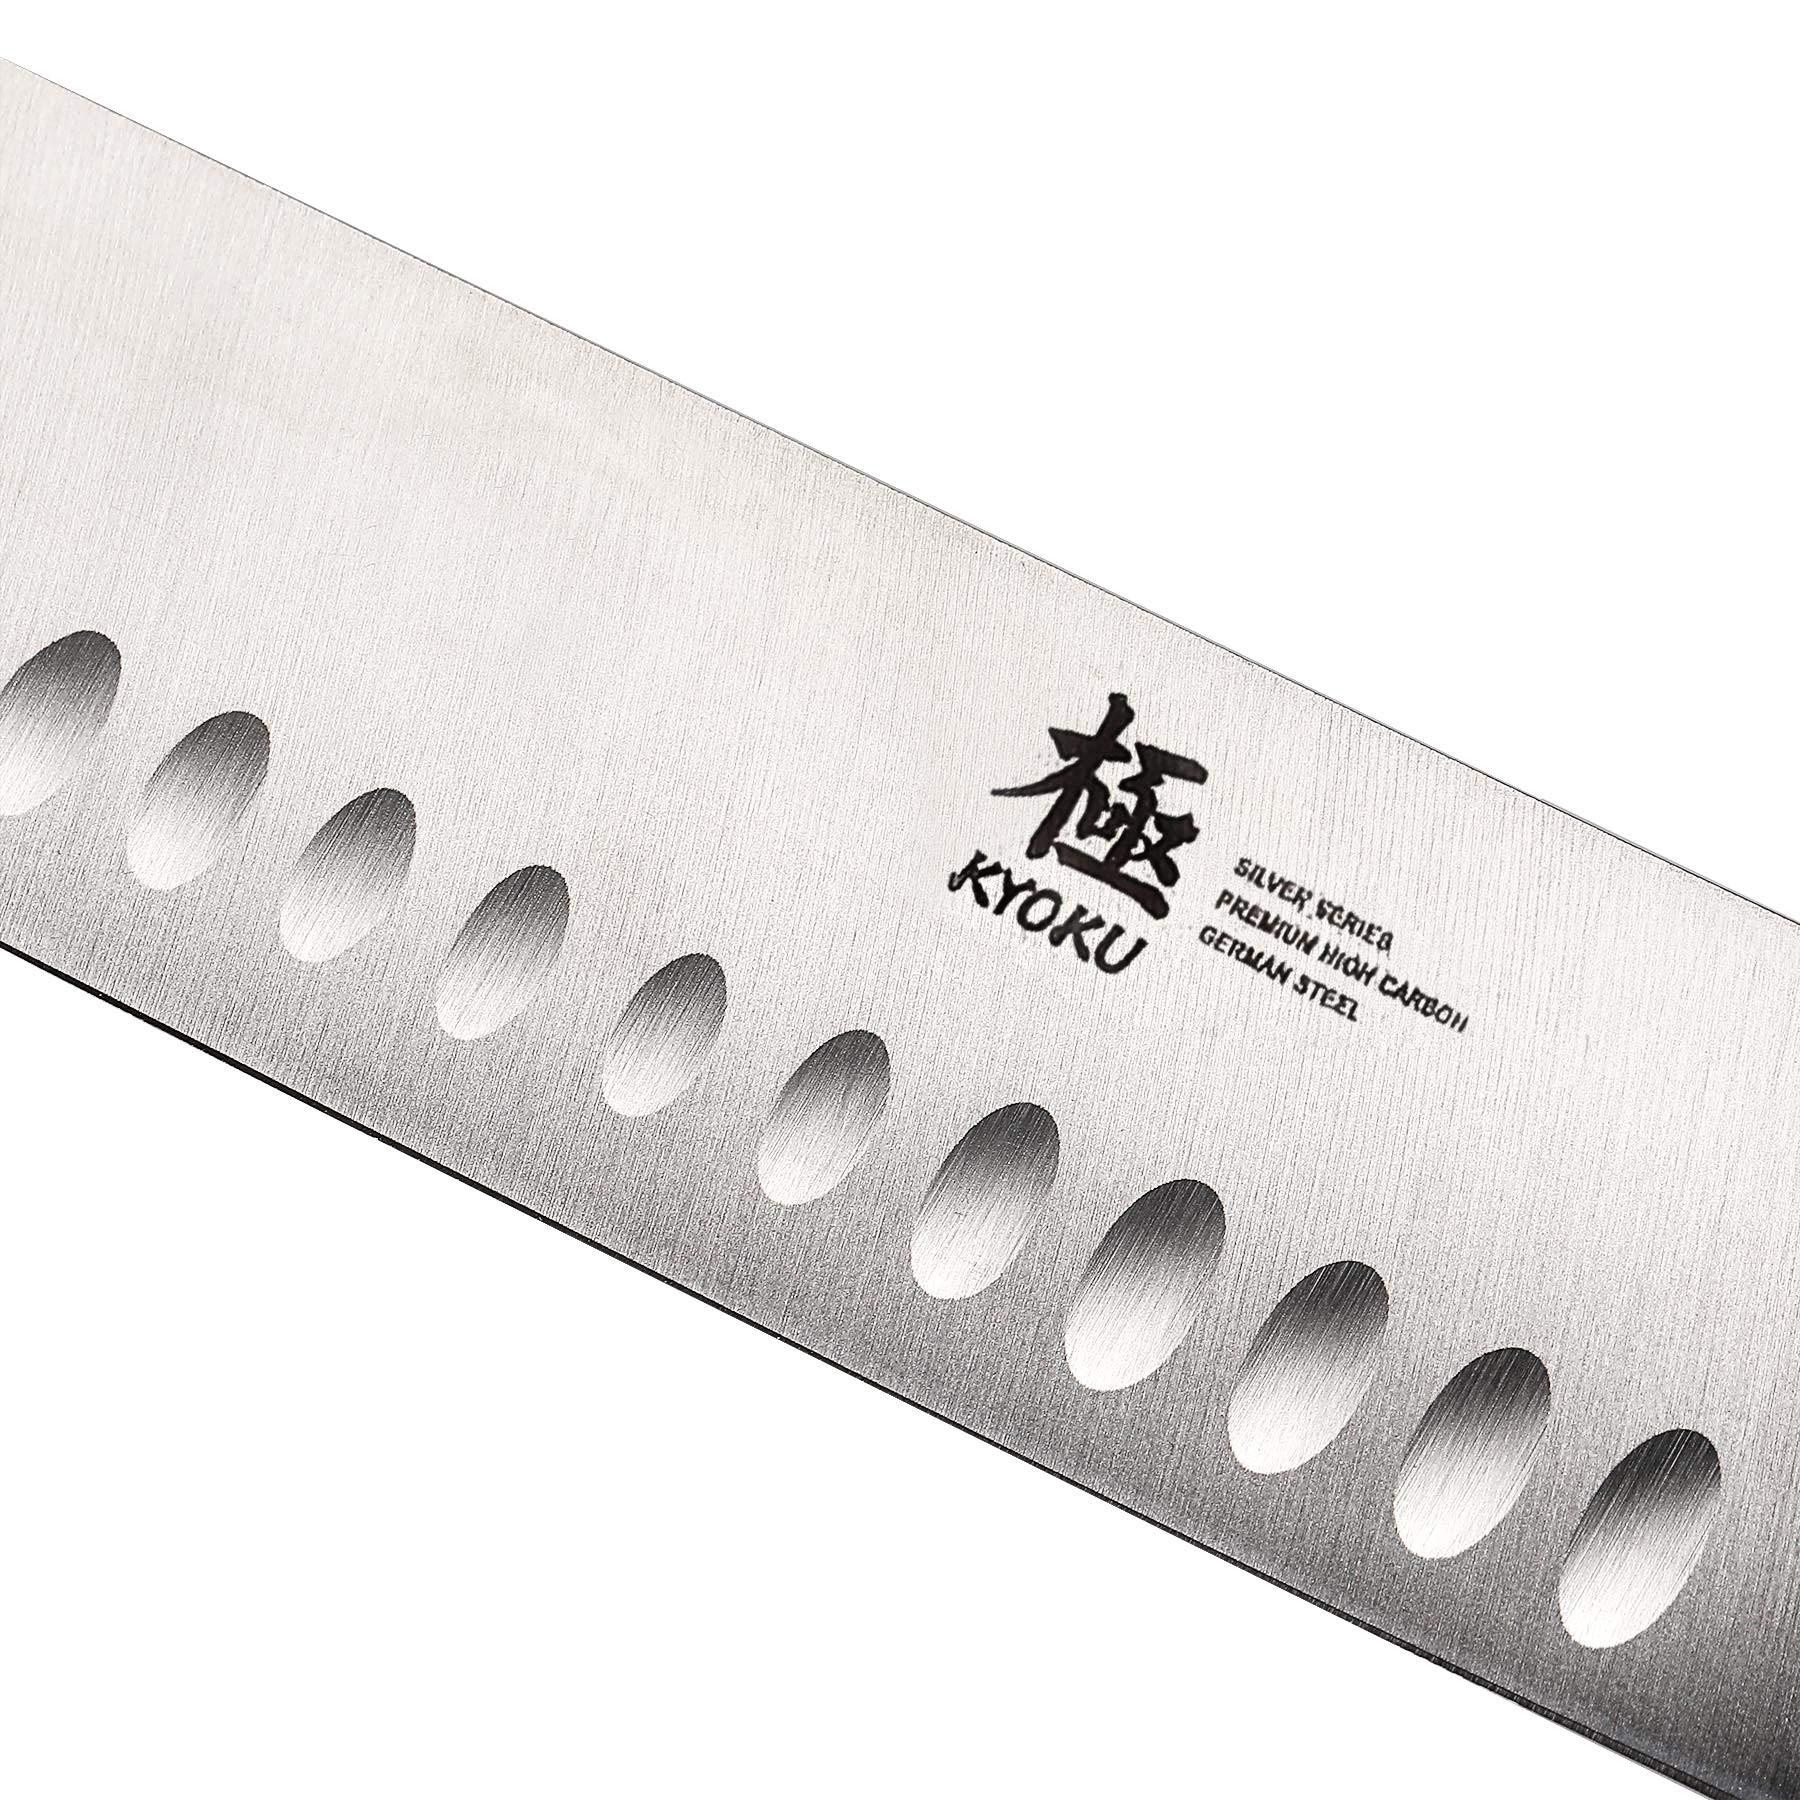 KYOKU Samurai Series - Nakiri Japanese Vegetable Knife 7'' with Sheath & Case - Full Tang - Japanese High Carbon Steel - Pakkawood Handle with Mosaic Pin by KYOKU (Image #8)